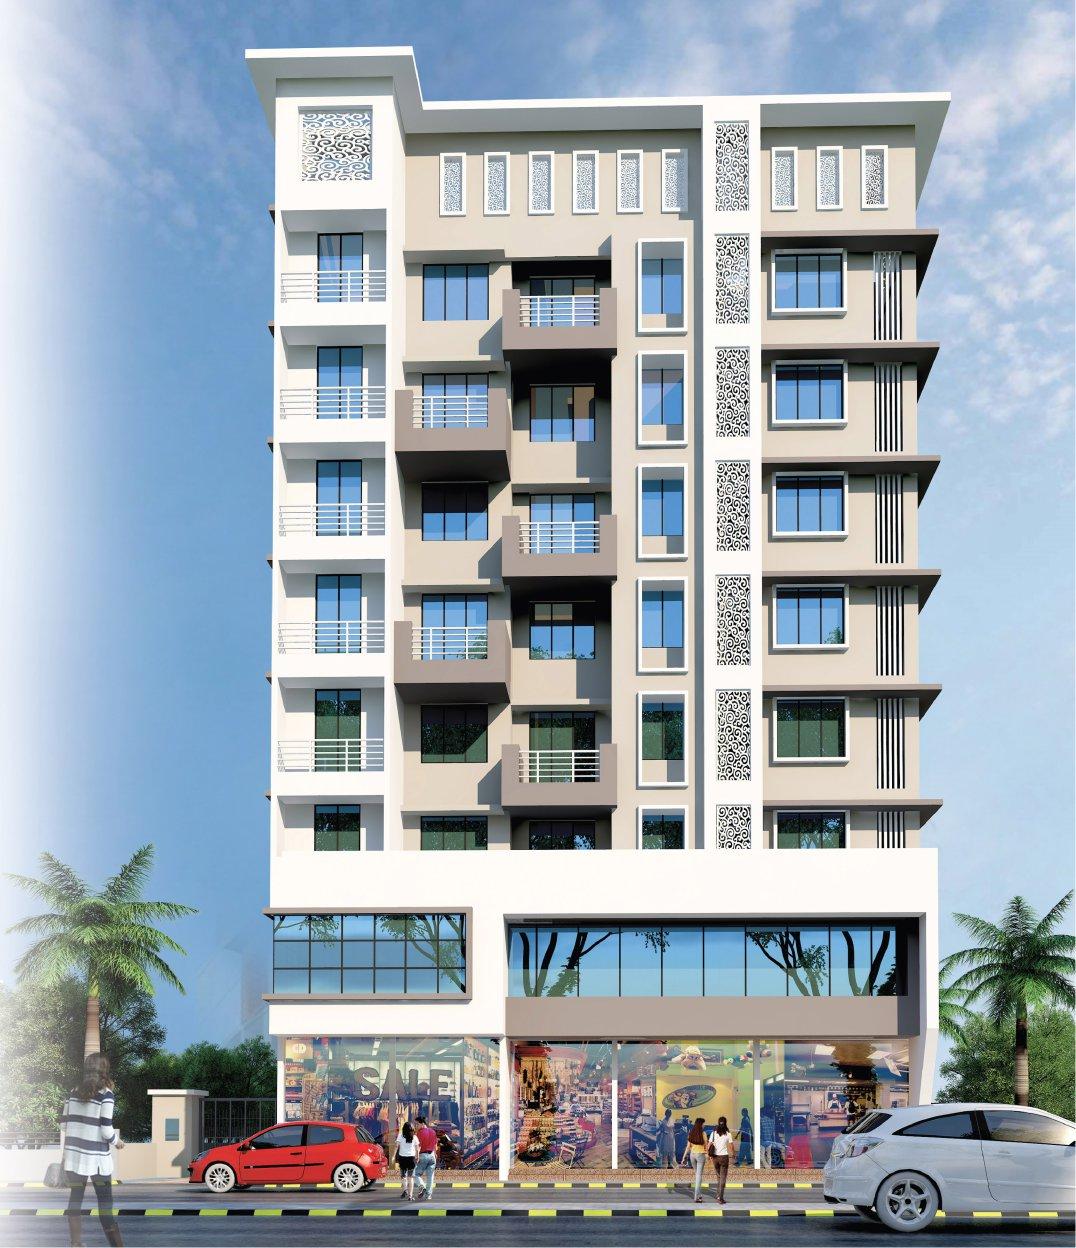 1 & 2 BHK Flats & Shops in Ambernath East - 421501 in Prakruti Sparsh